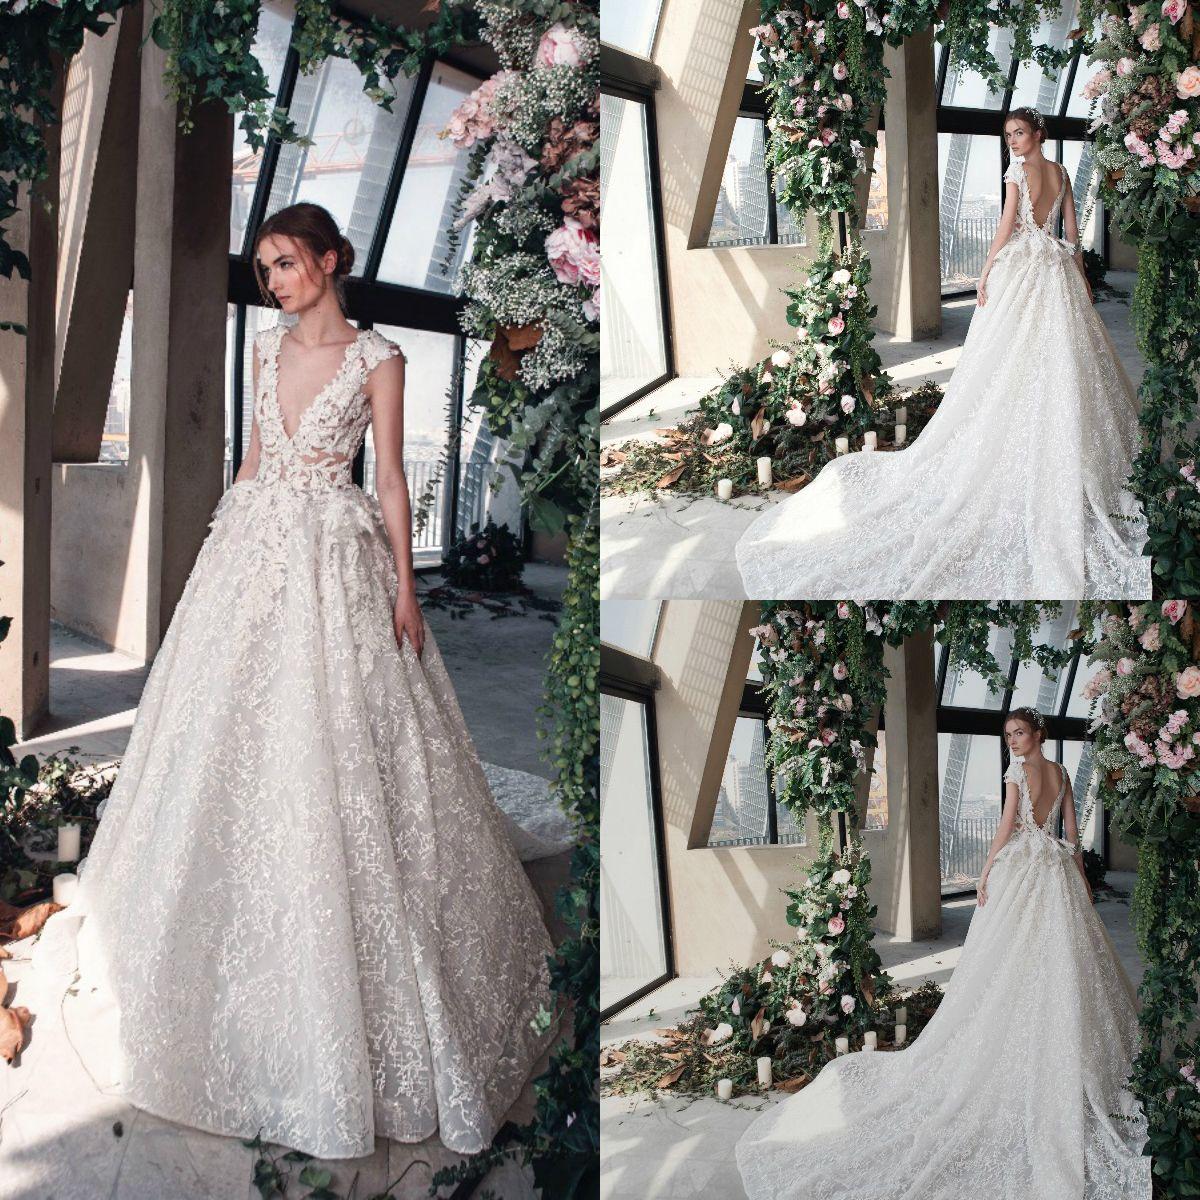 Discount La Mariée Spring 2019 Tony Ward Wedding Dresses Deep V Neck  Sequins Backless Sashes Lace Sleeveless Bridal Gowns Vestidos De Noiva  Wedding Dresses ... d9d8a268473b